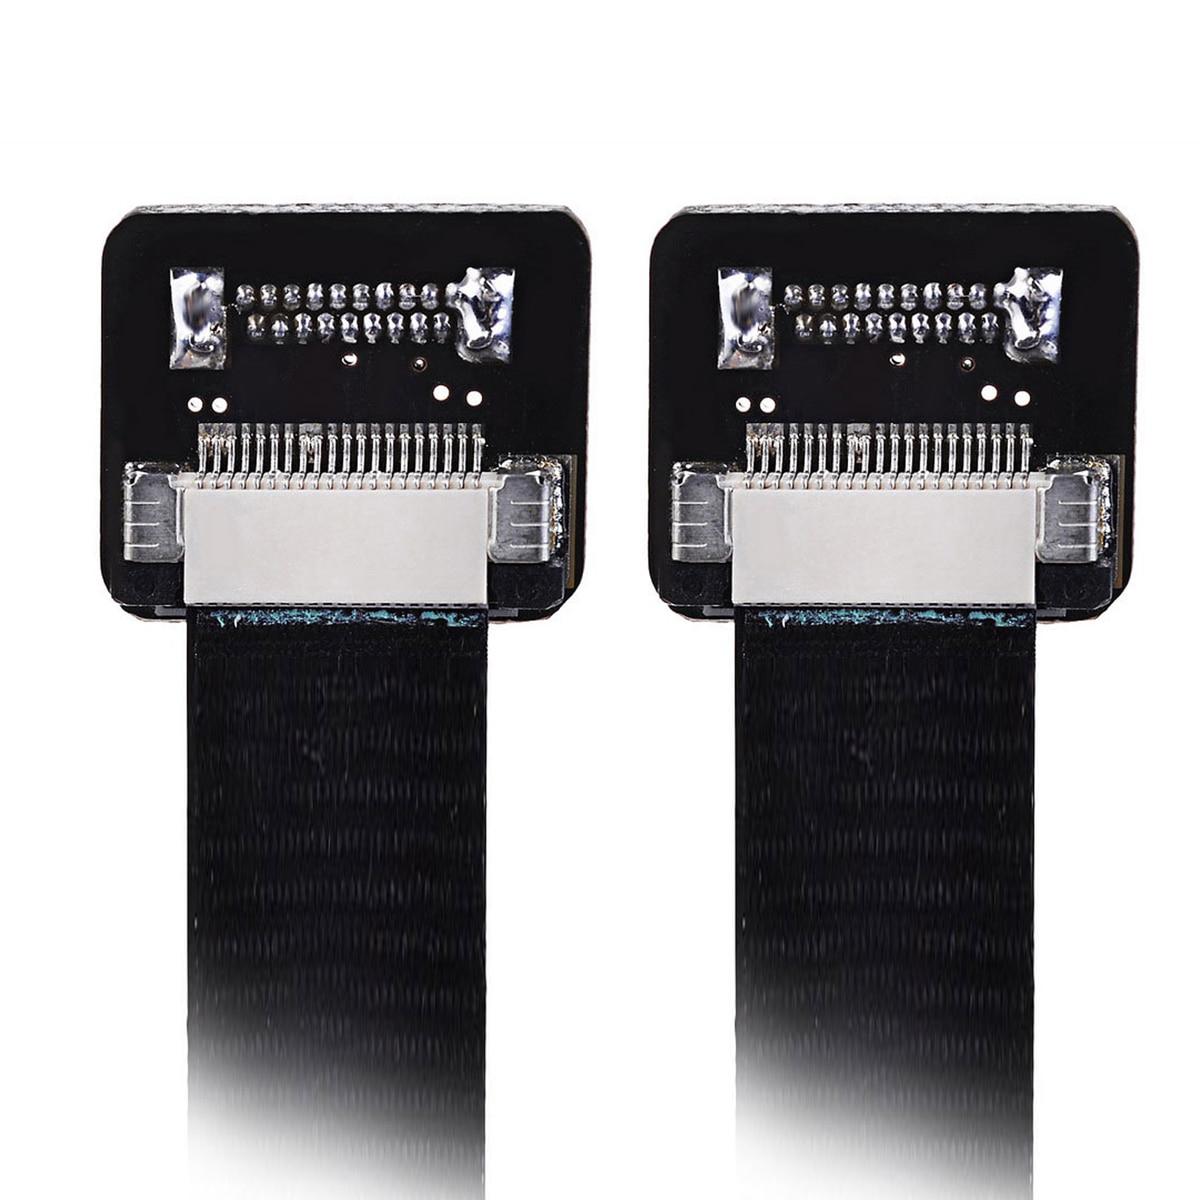 CYFPV cinta FPC Cable plano 0,5mm paso 20Pin para HDMI HDTV FPV multicóptero fotografía aérea 50cm 20cm 10cm negro